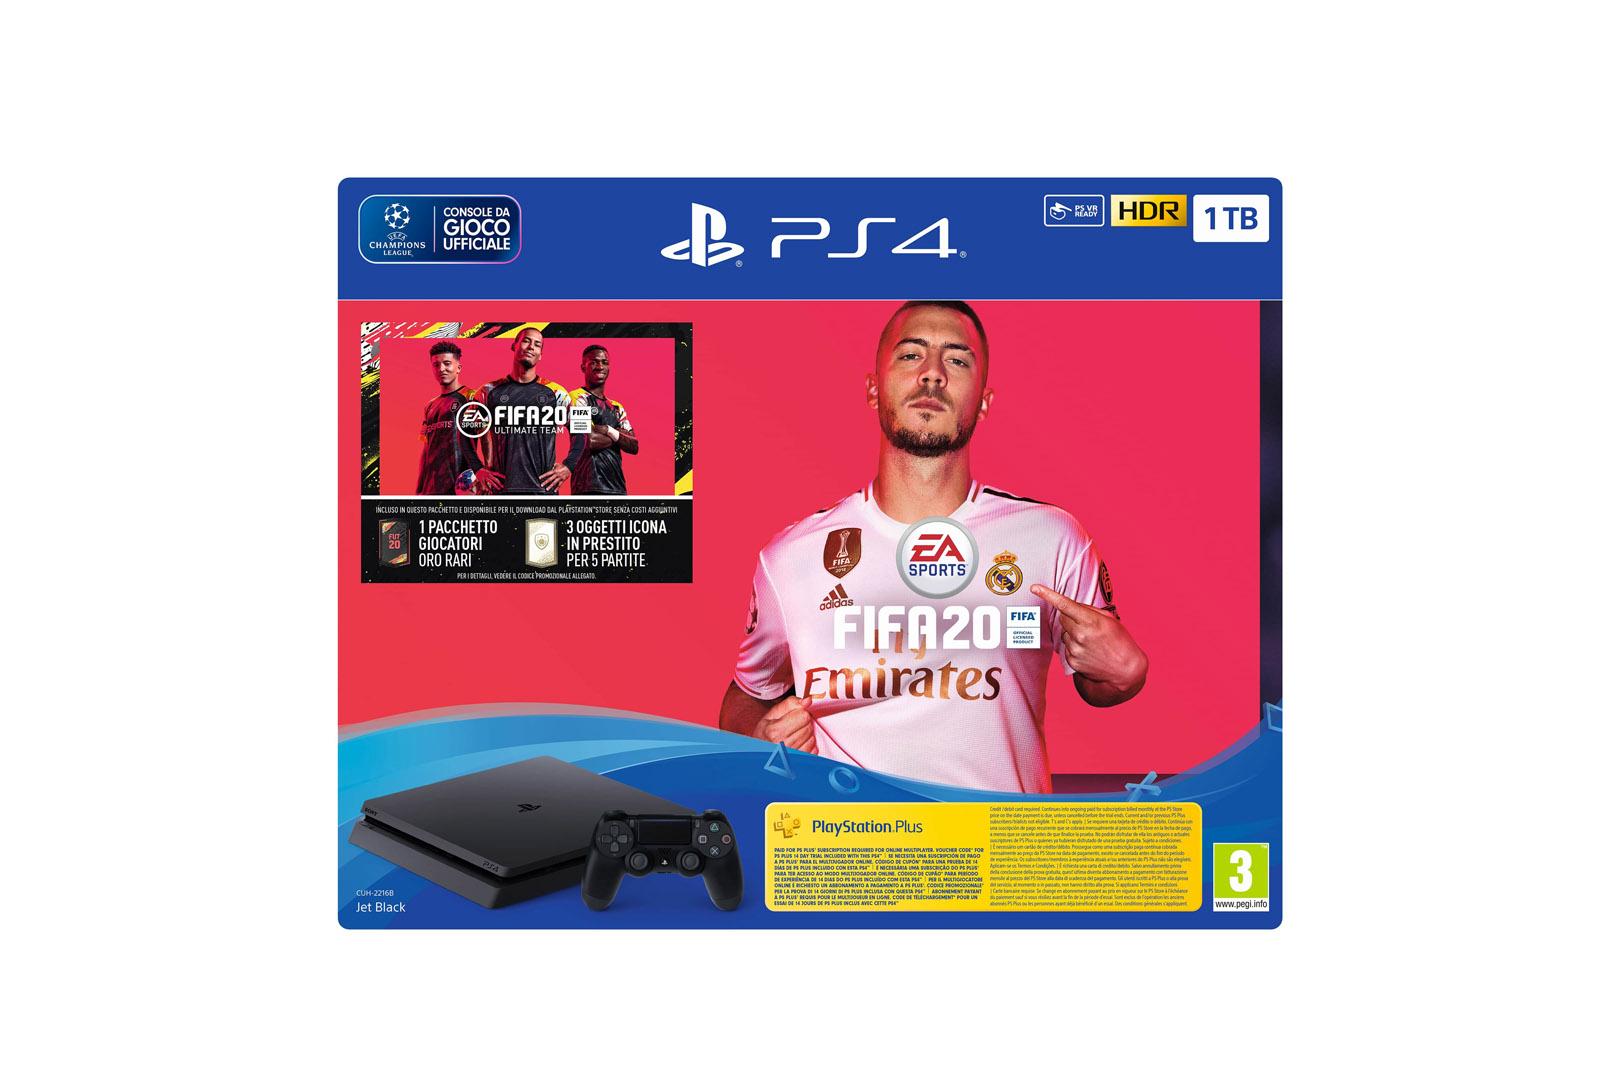 Sony Playstation 4 Slim 1TB (PS4) Black + FIFA 20